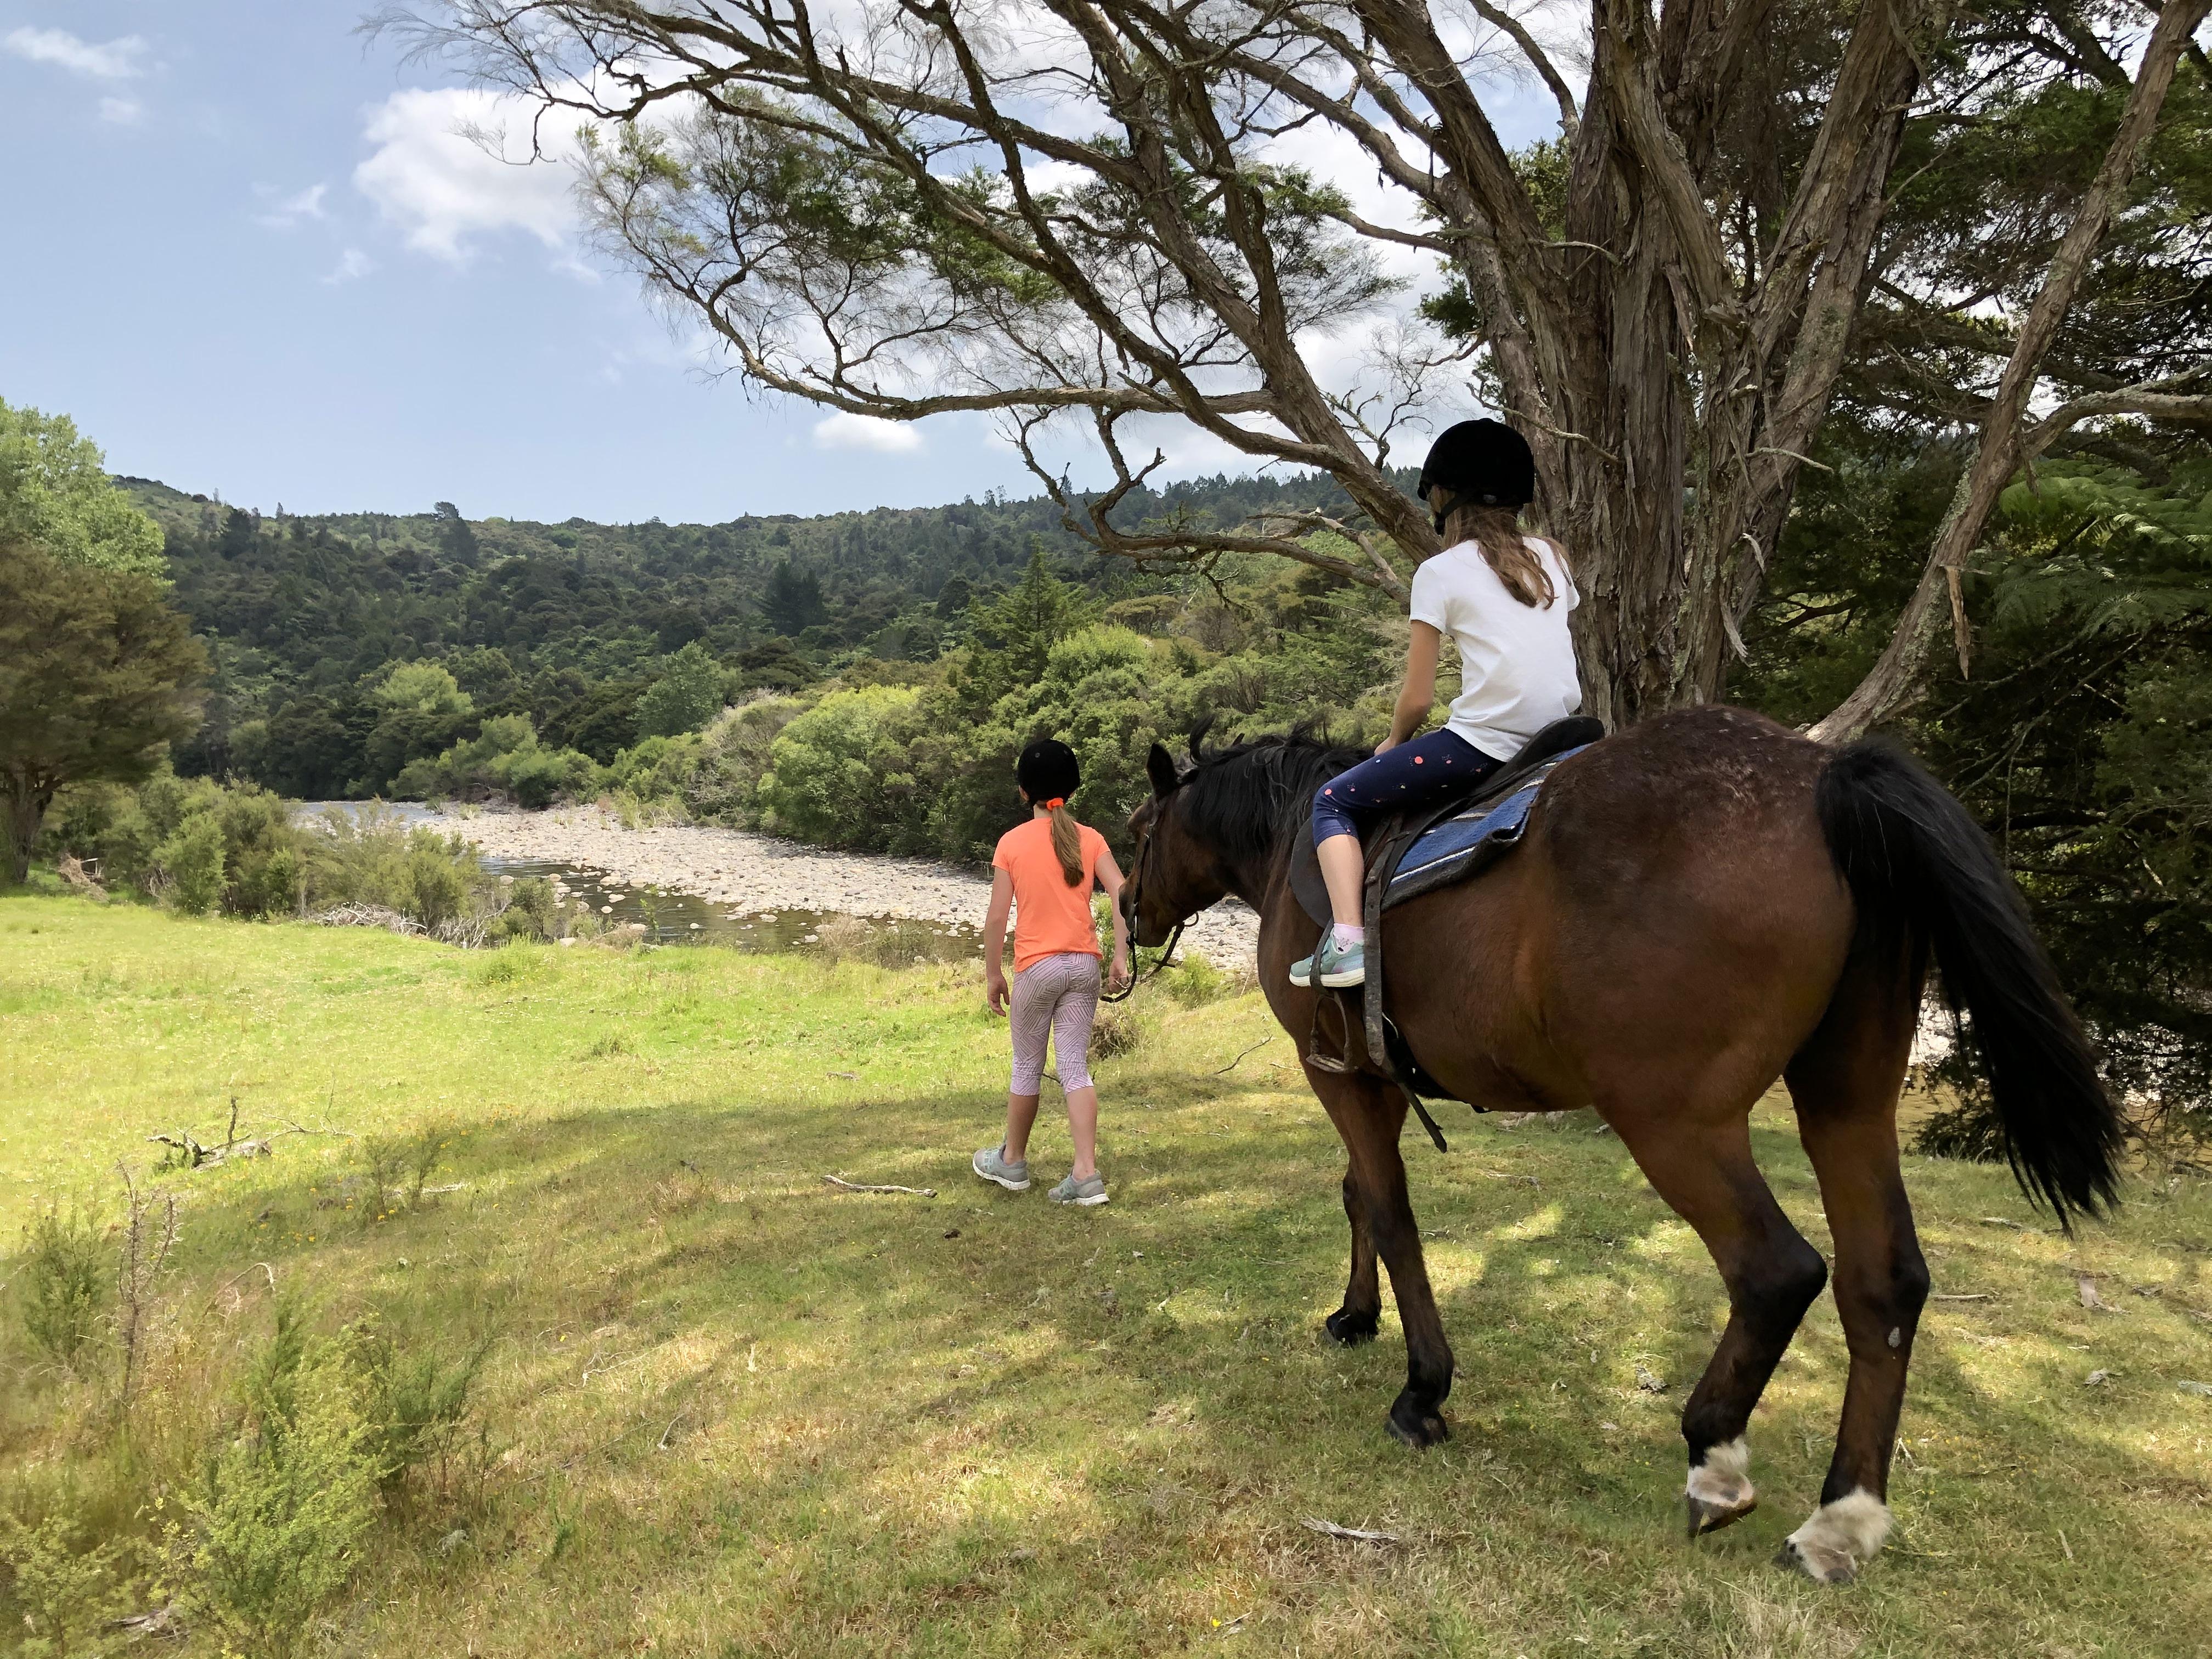 Horse riding along the river.